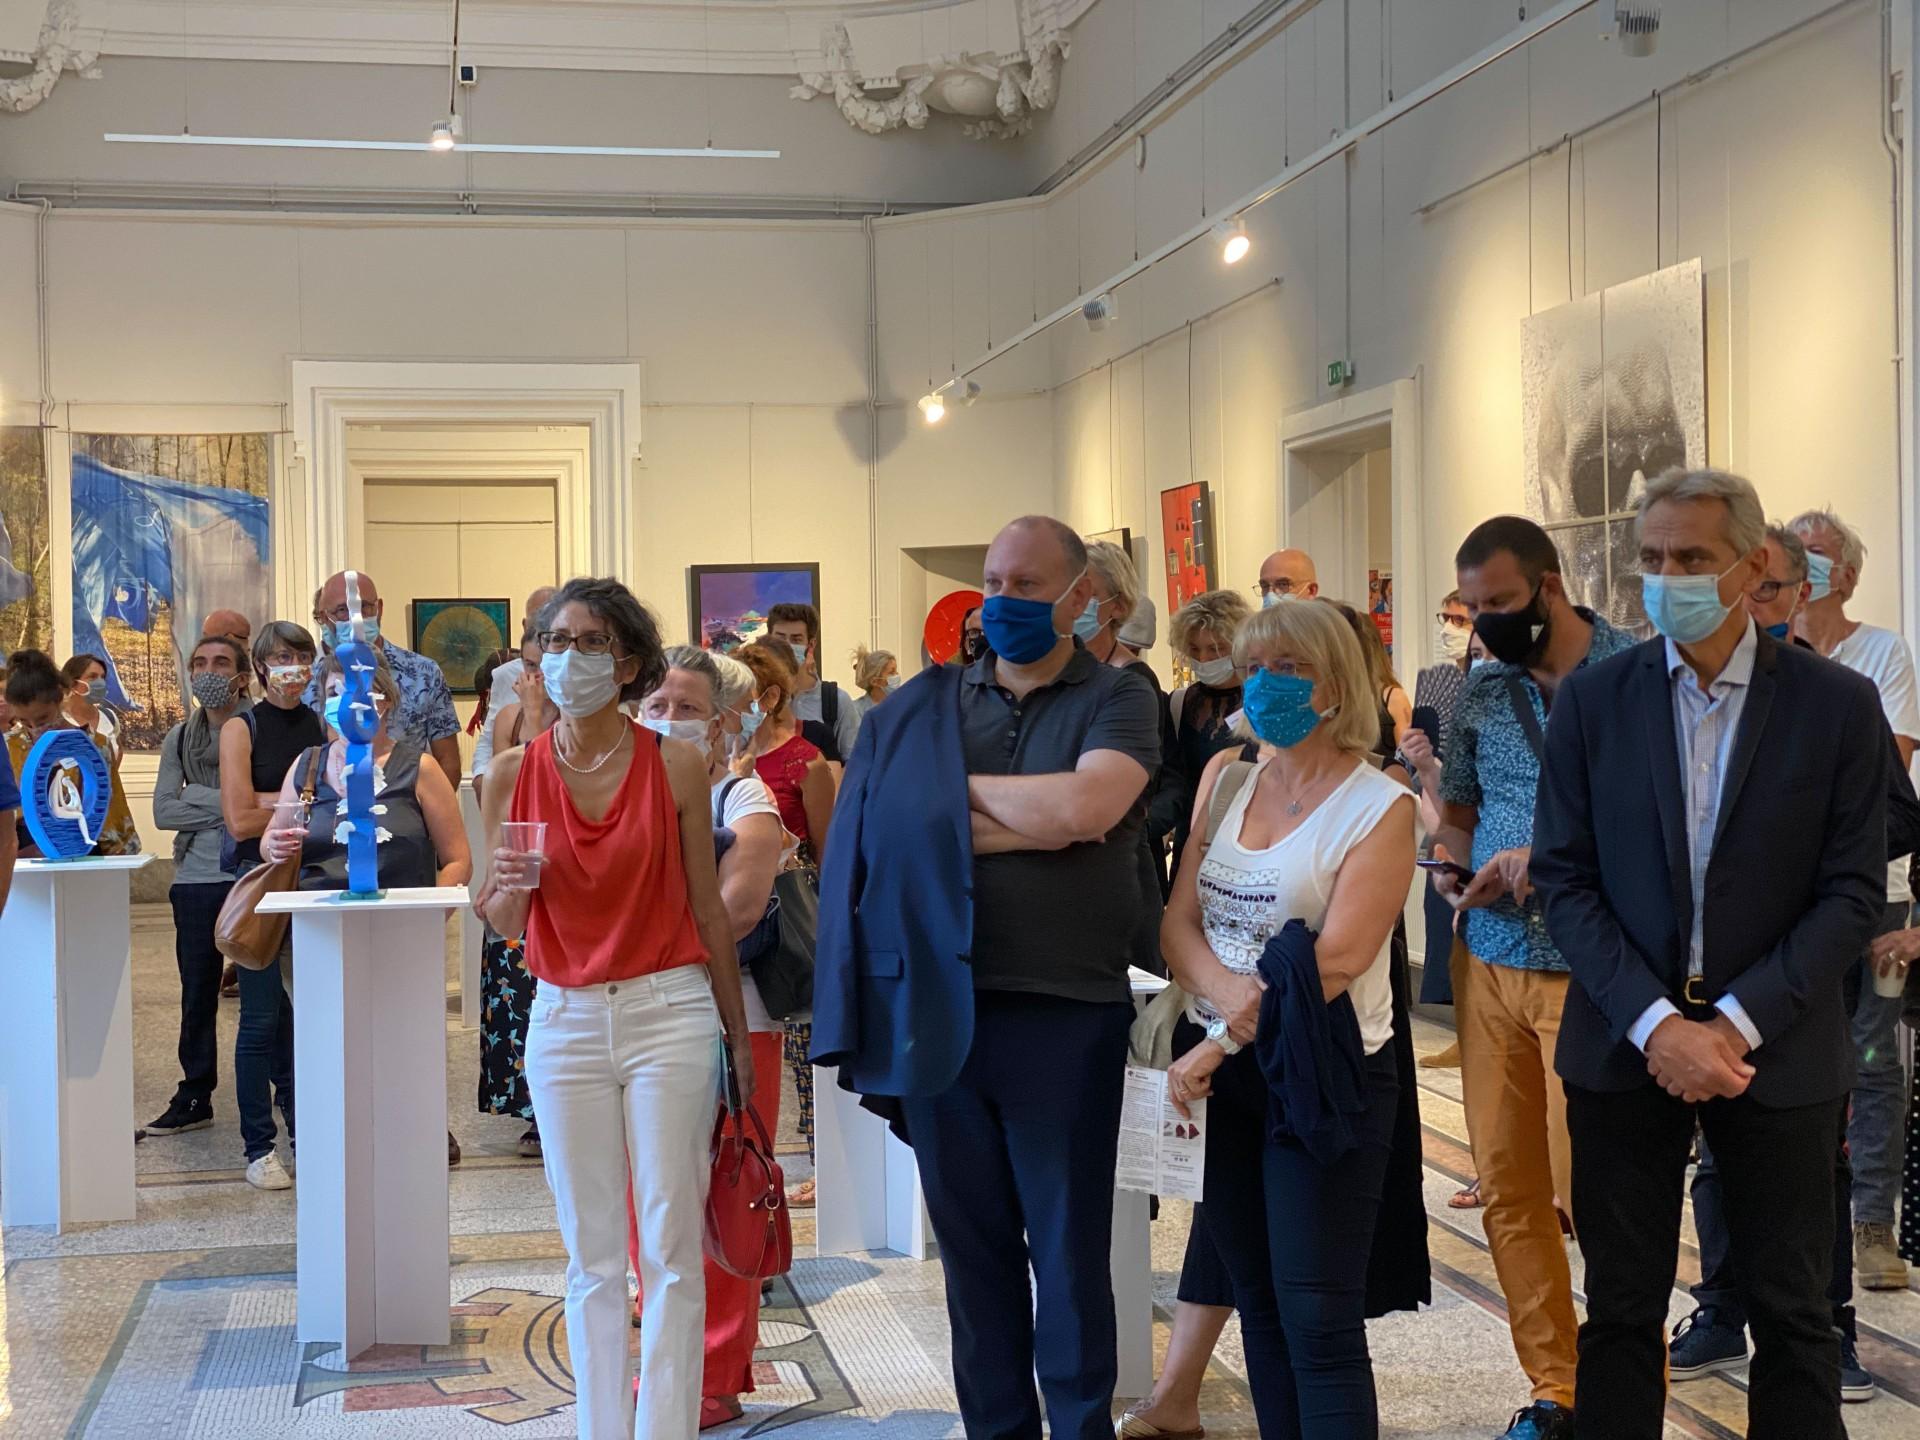 Salon regain art lyon 20 vernissage 17